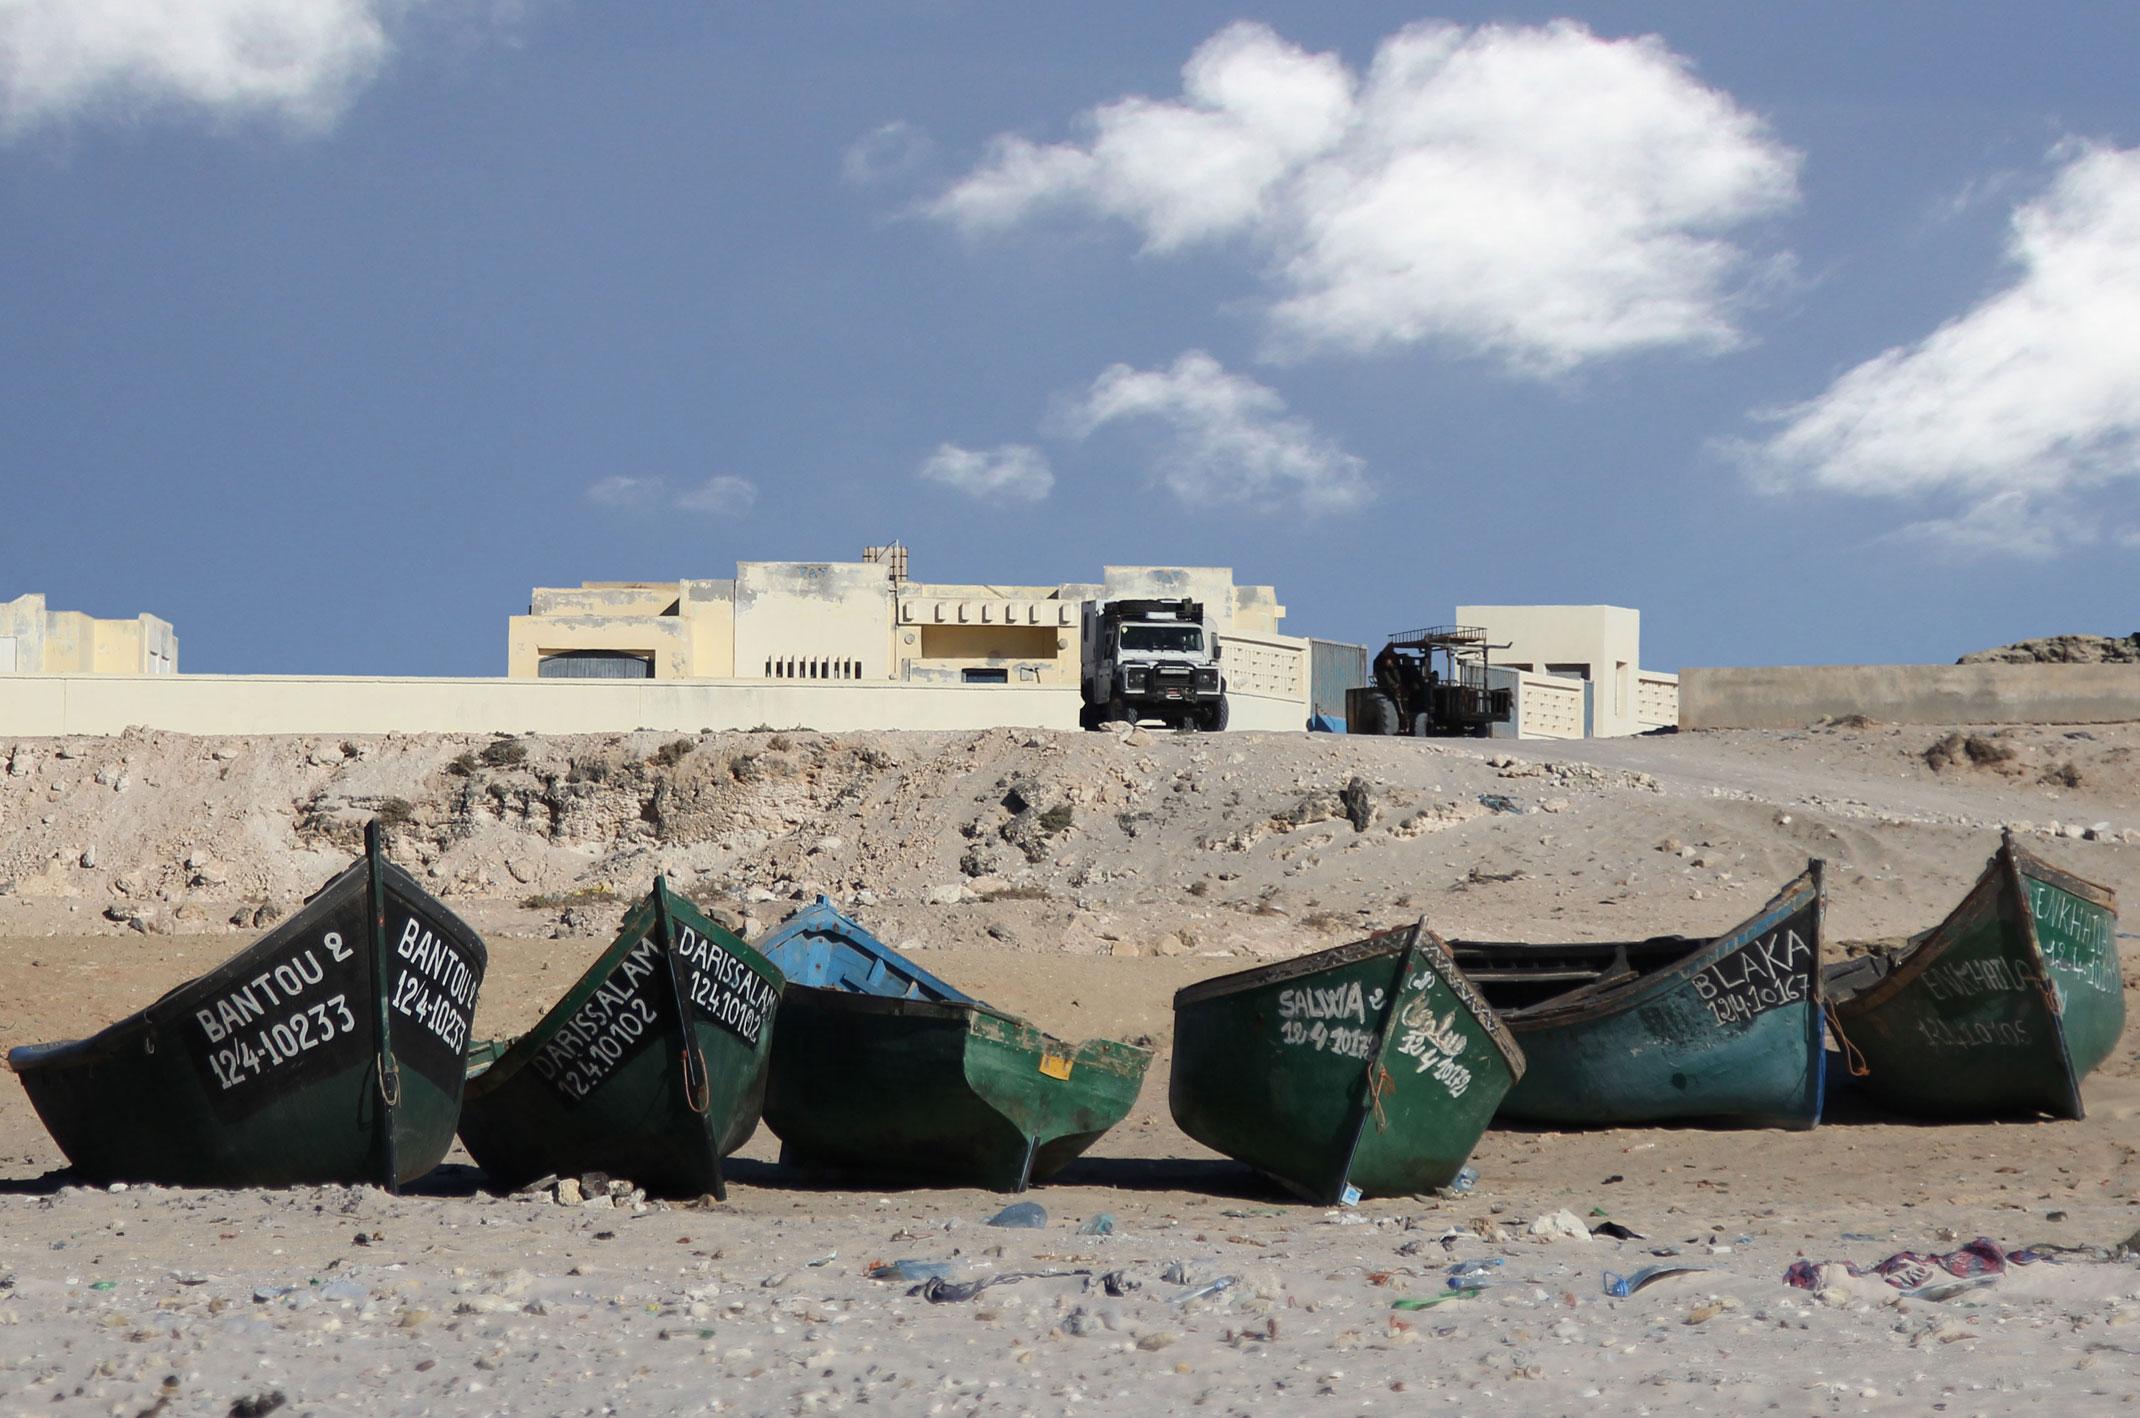 Lamhiriz,Maroko